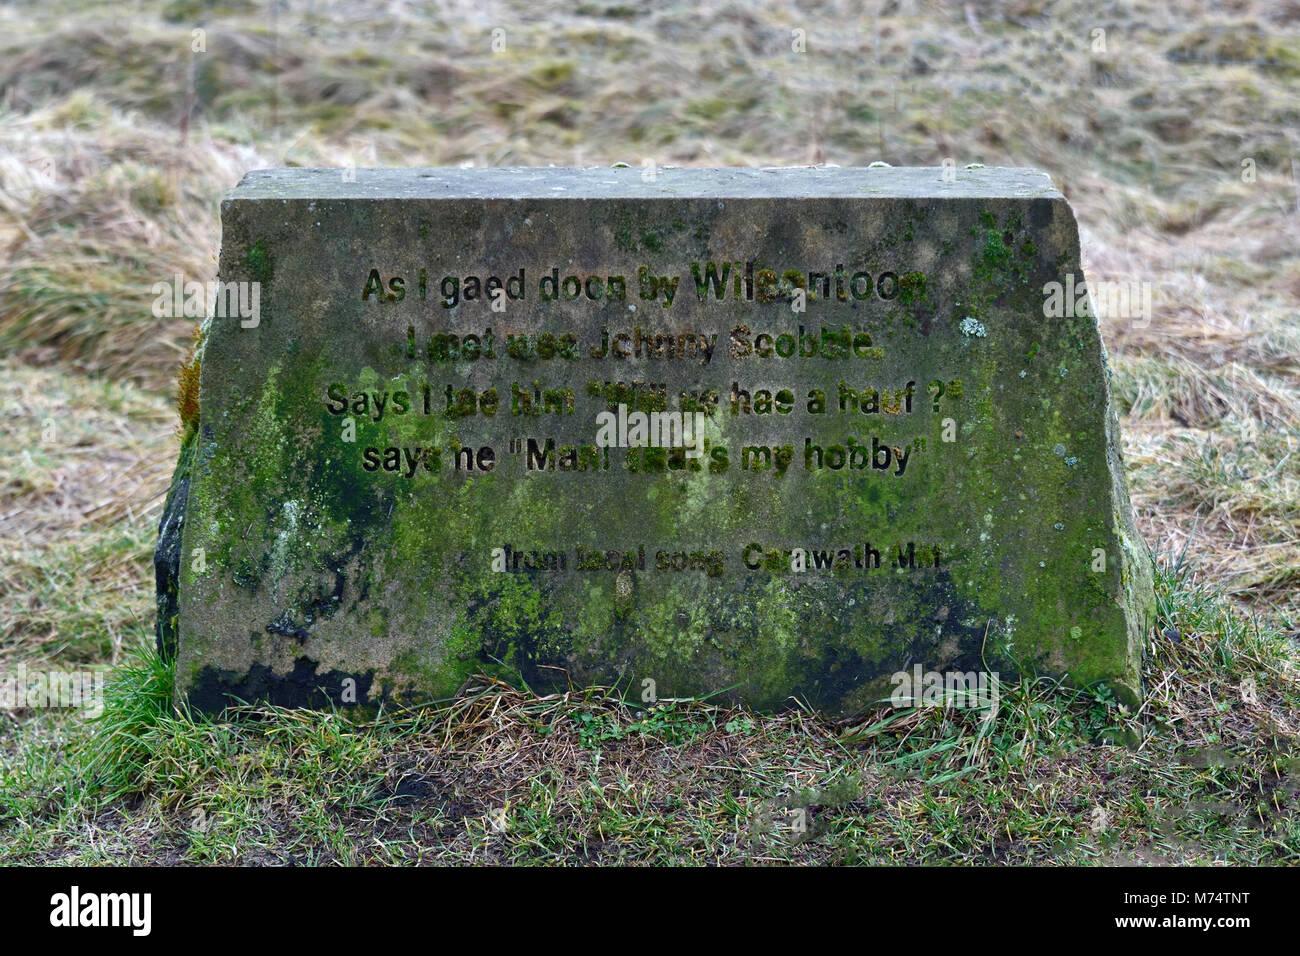 Inscribed stone. Wilsontown, Forth, Lanarkshire, Scotland, United Kingdom, Europe. - Stock Image